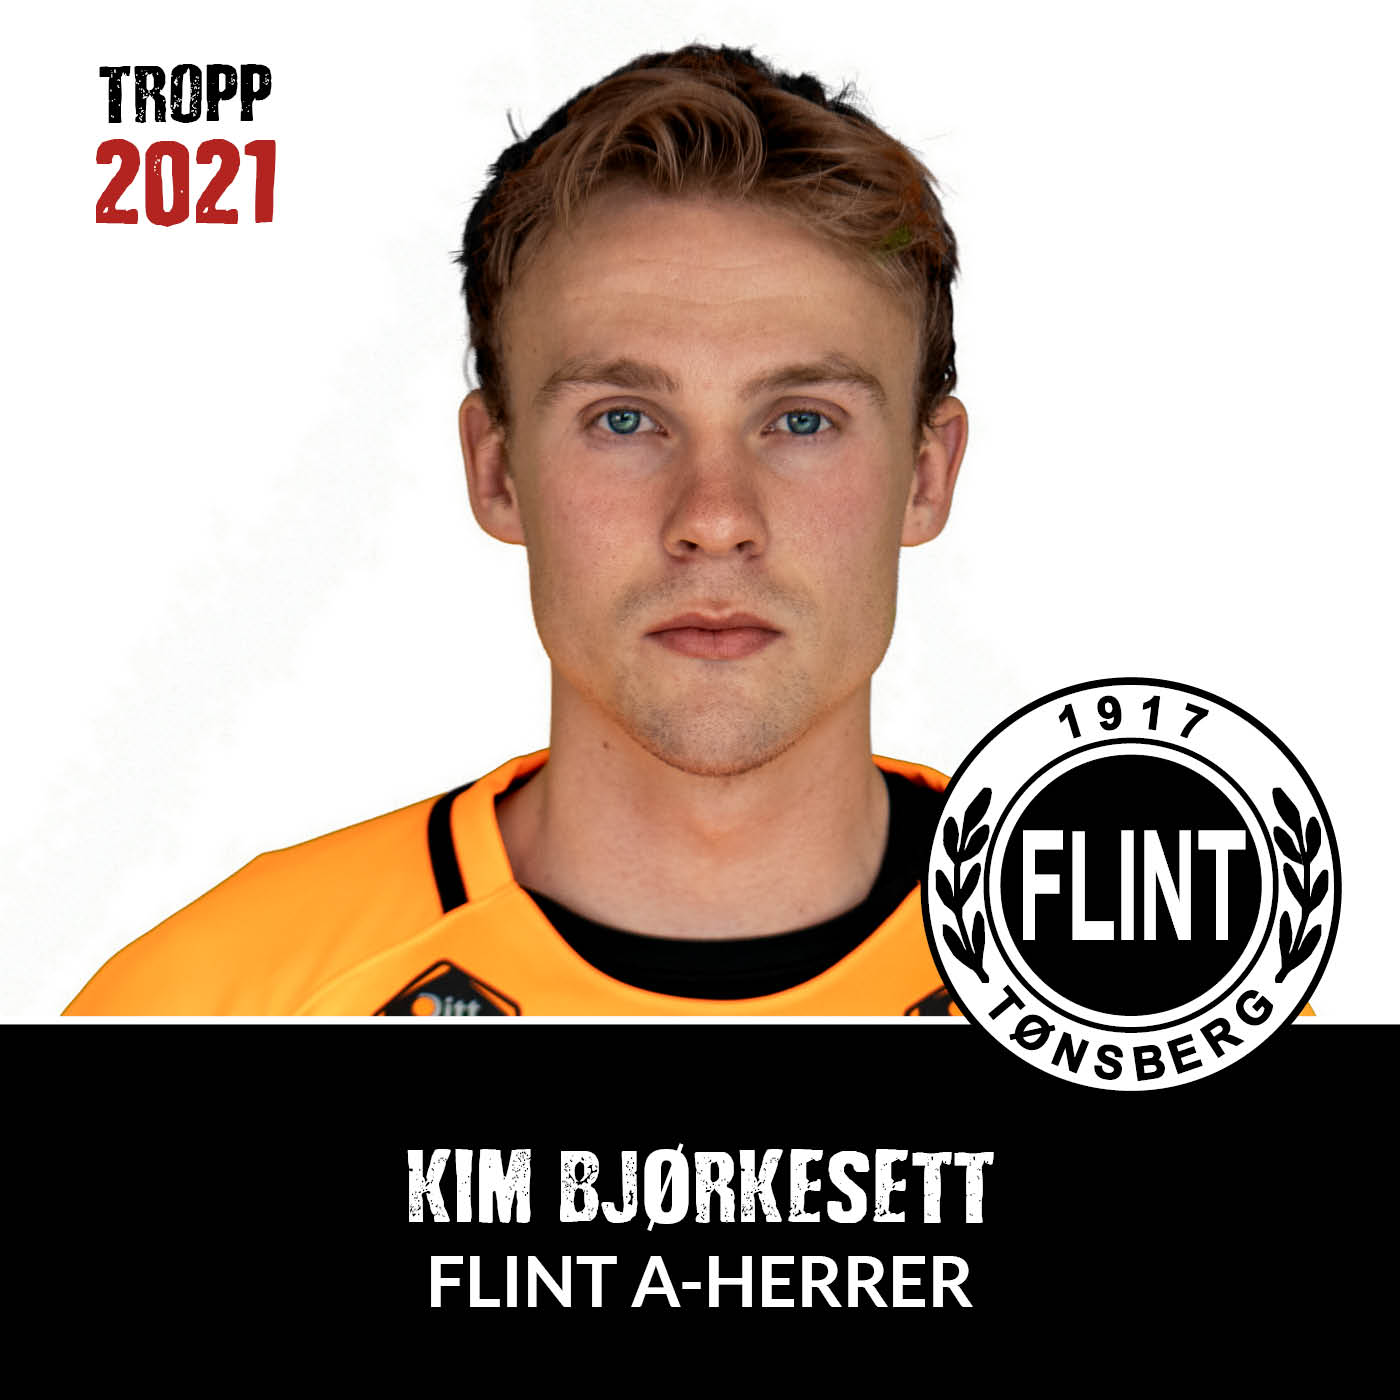 https://www.flintfotball.no/wp-content/uploads/2021/02/A-herrer-2021-Kim-Bjorkesett.jpg